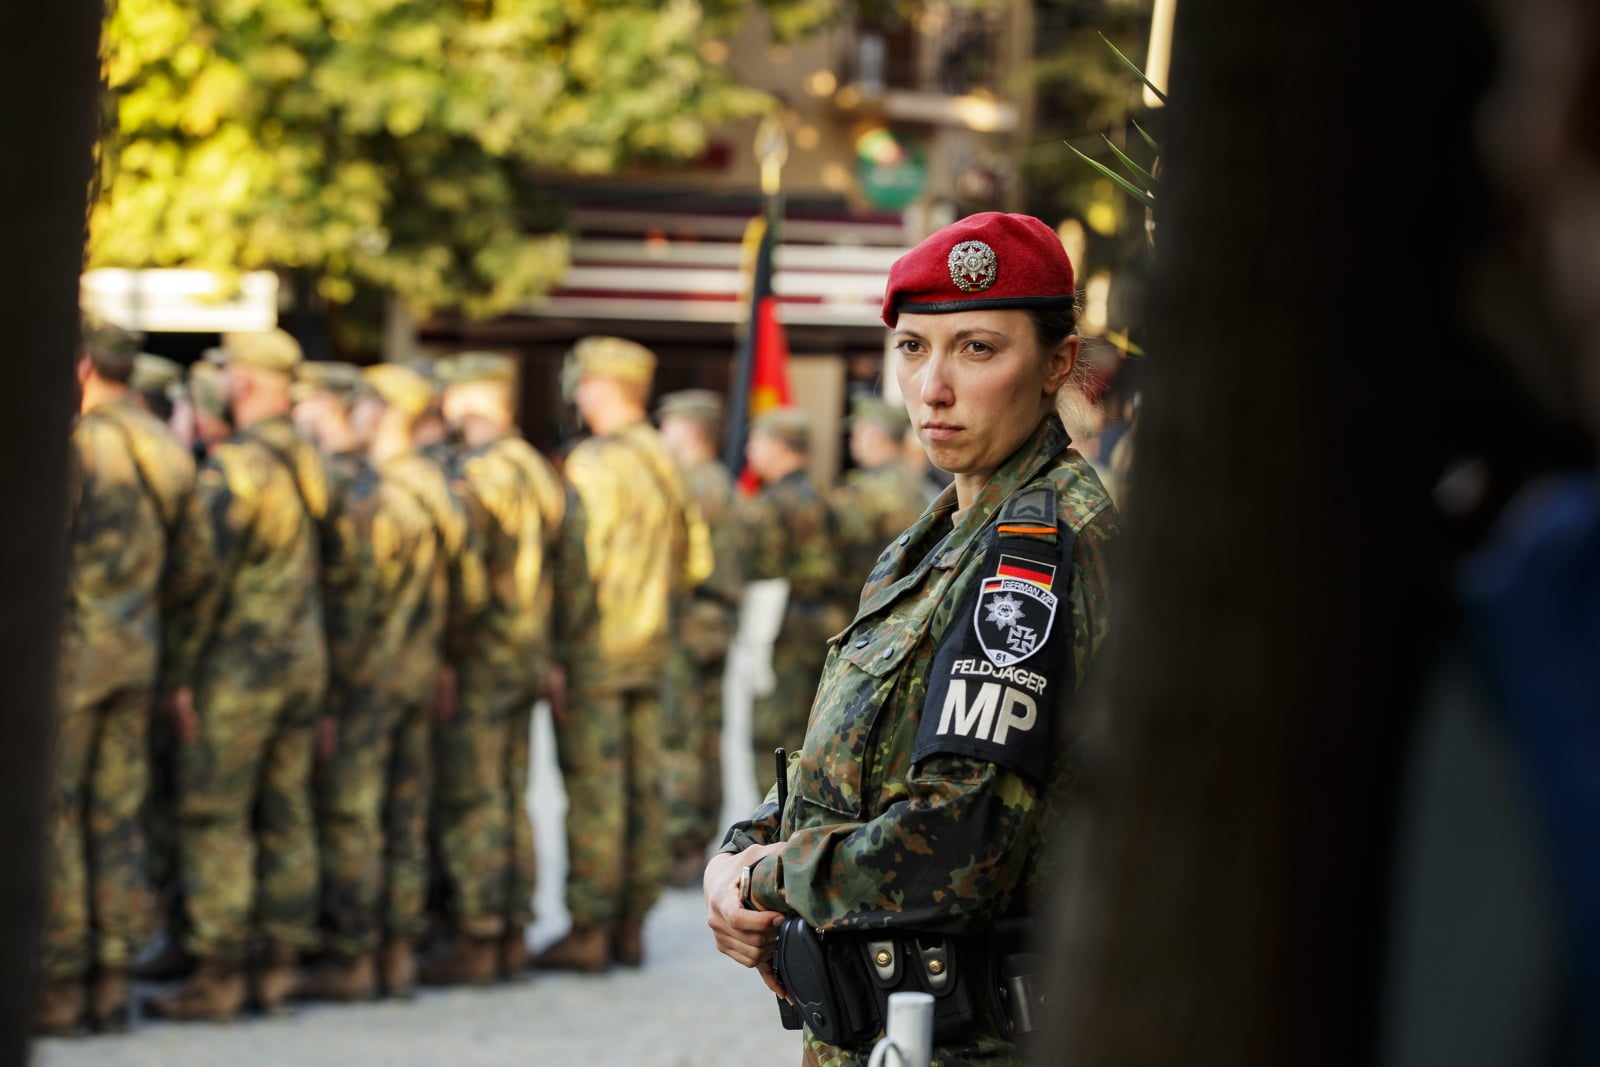 Kosowo fot. EPA/VALDRIN XHEMAJ